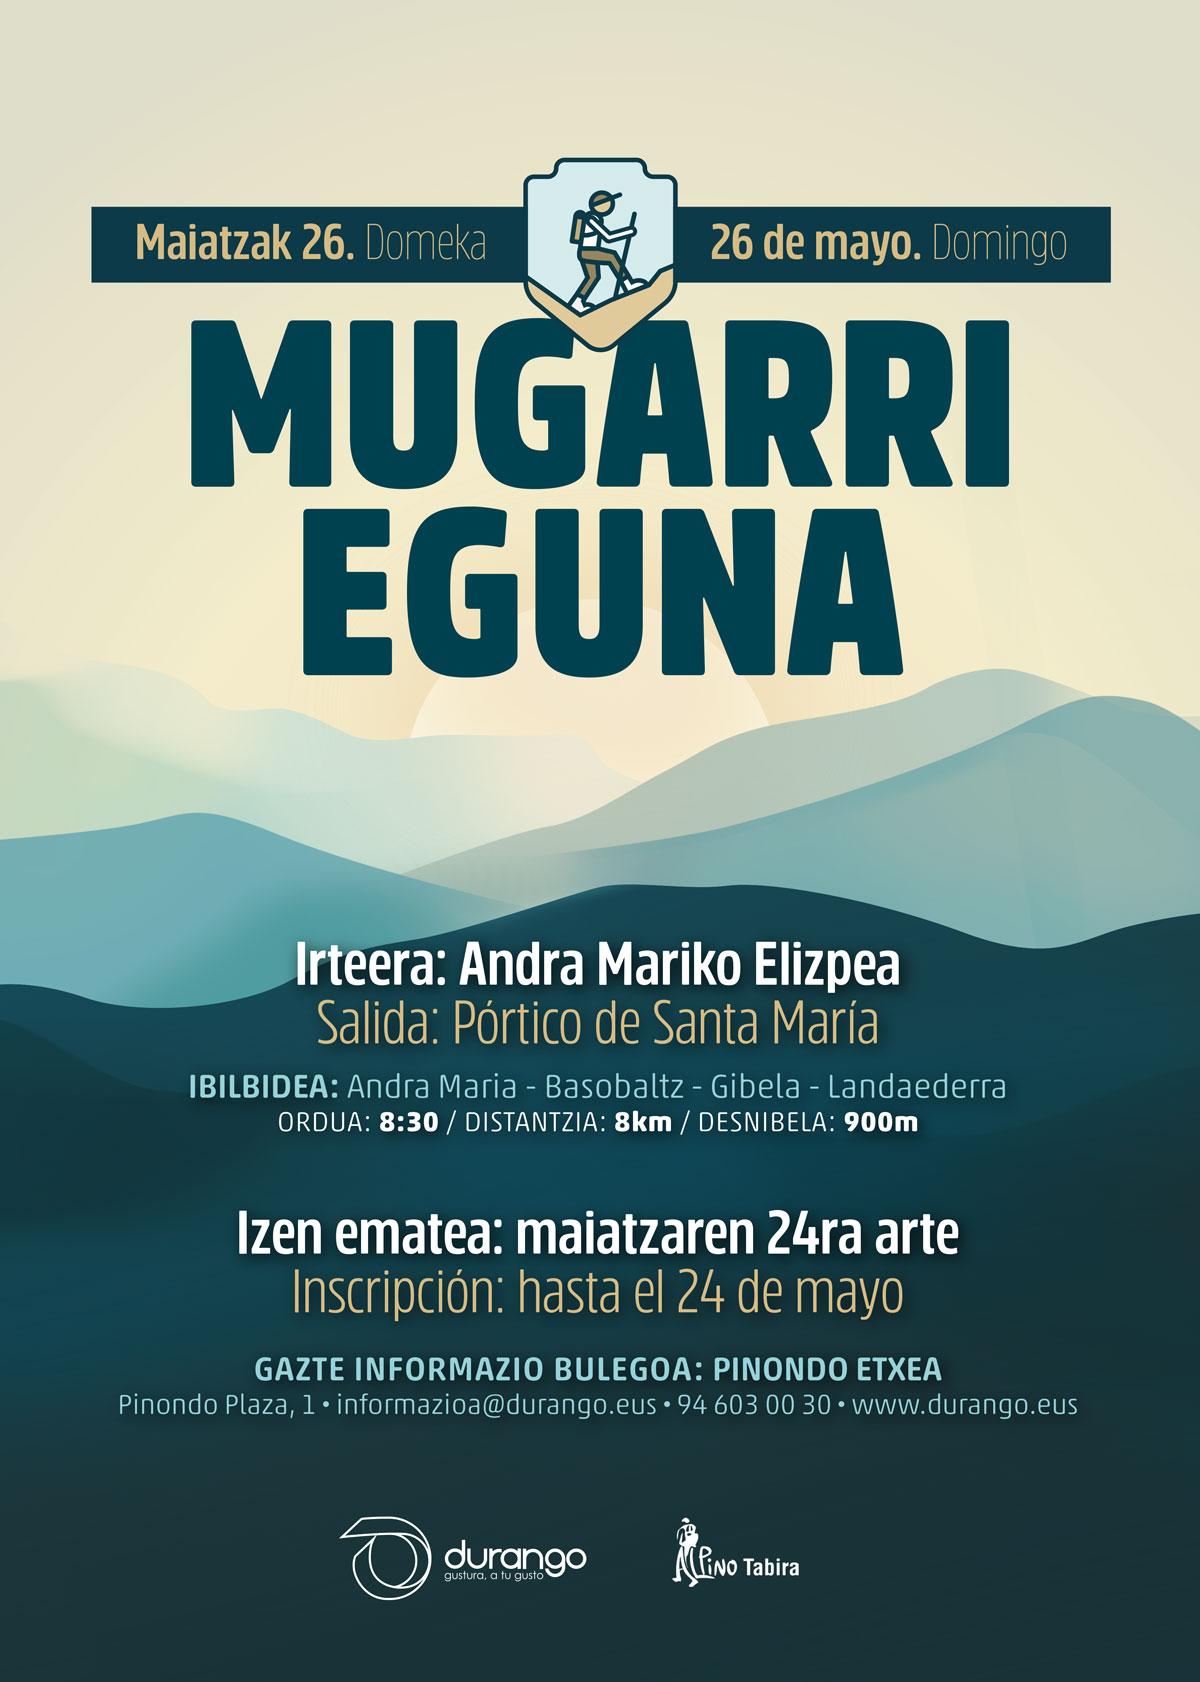 MUGARRI EGUNA 2019